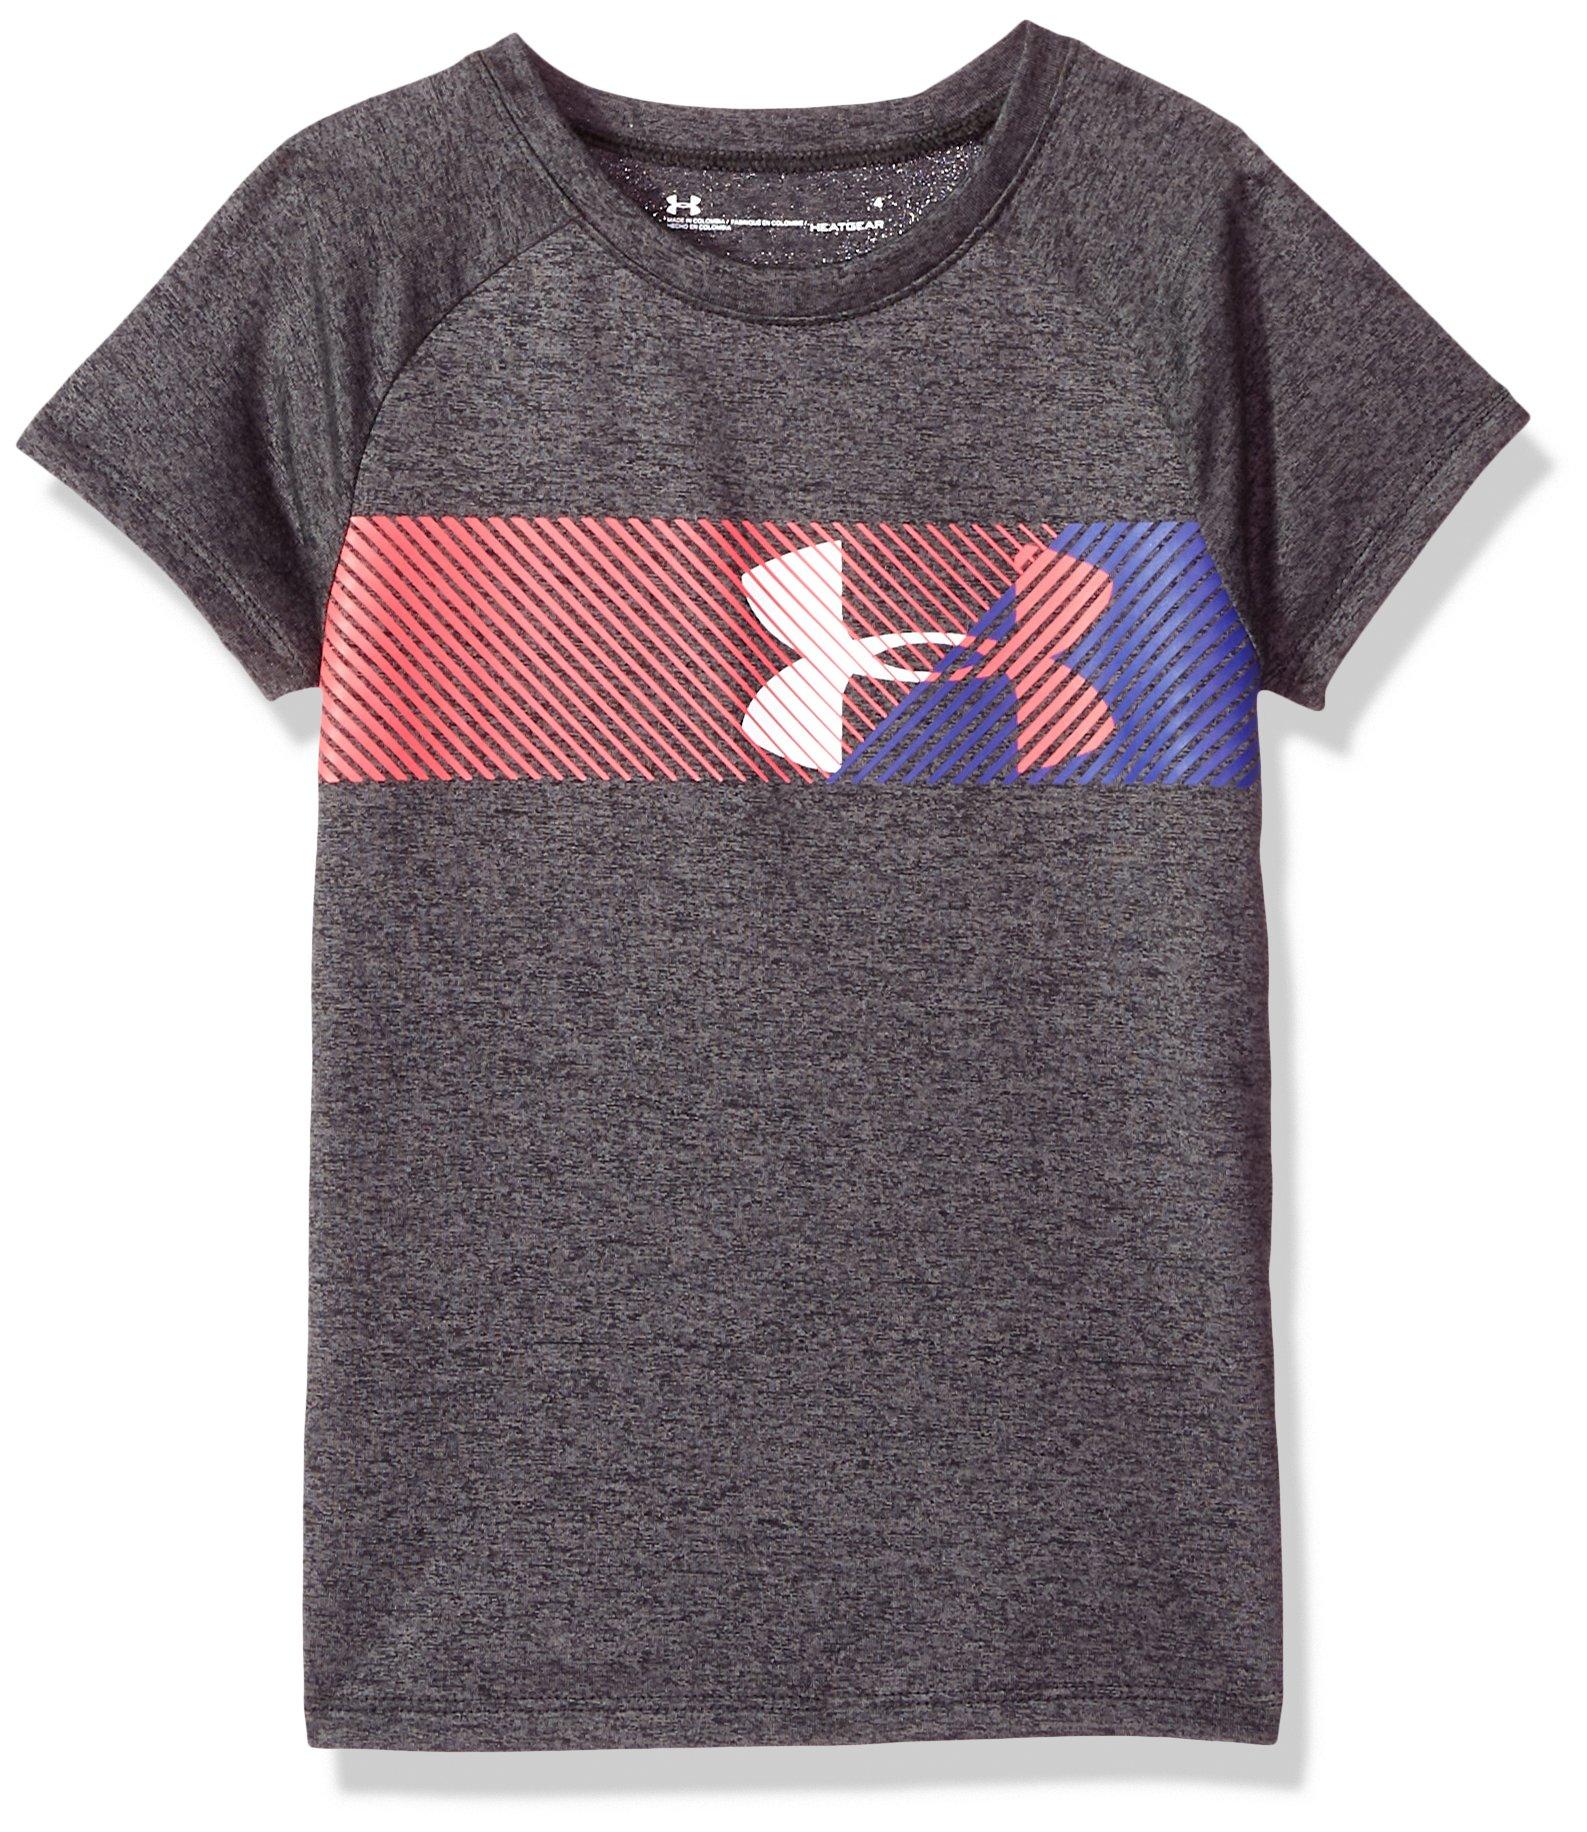 Under Armour Girls' Big Logo T-Shirt, Pitch